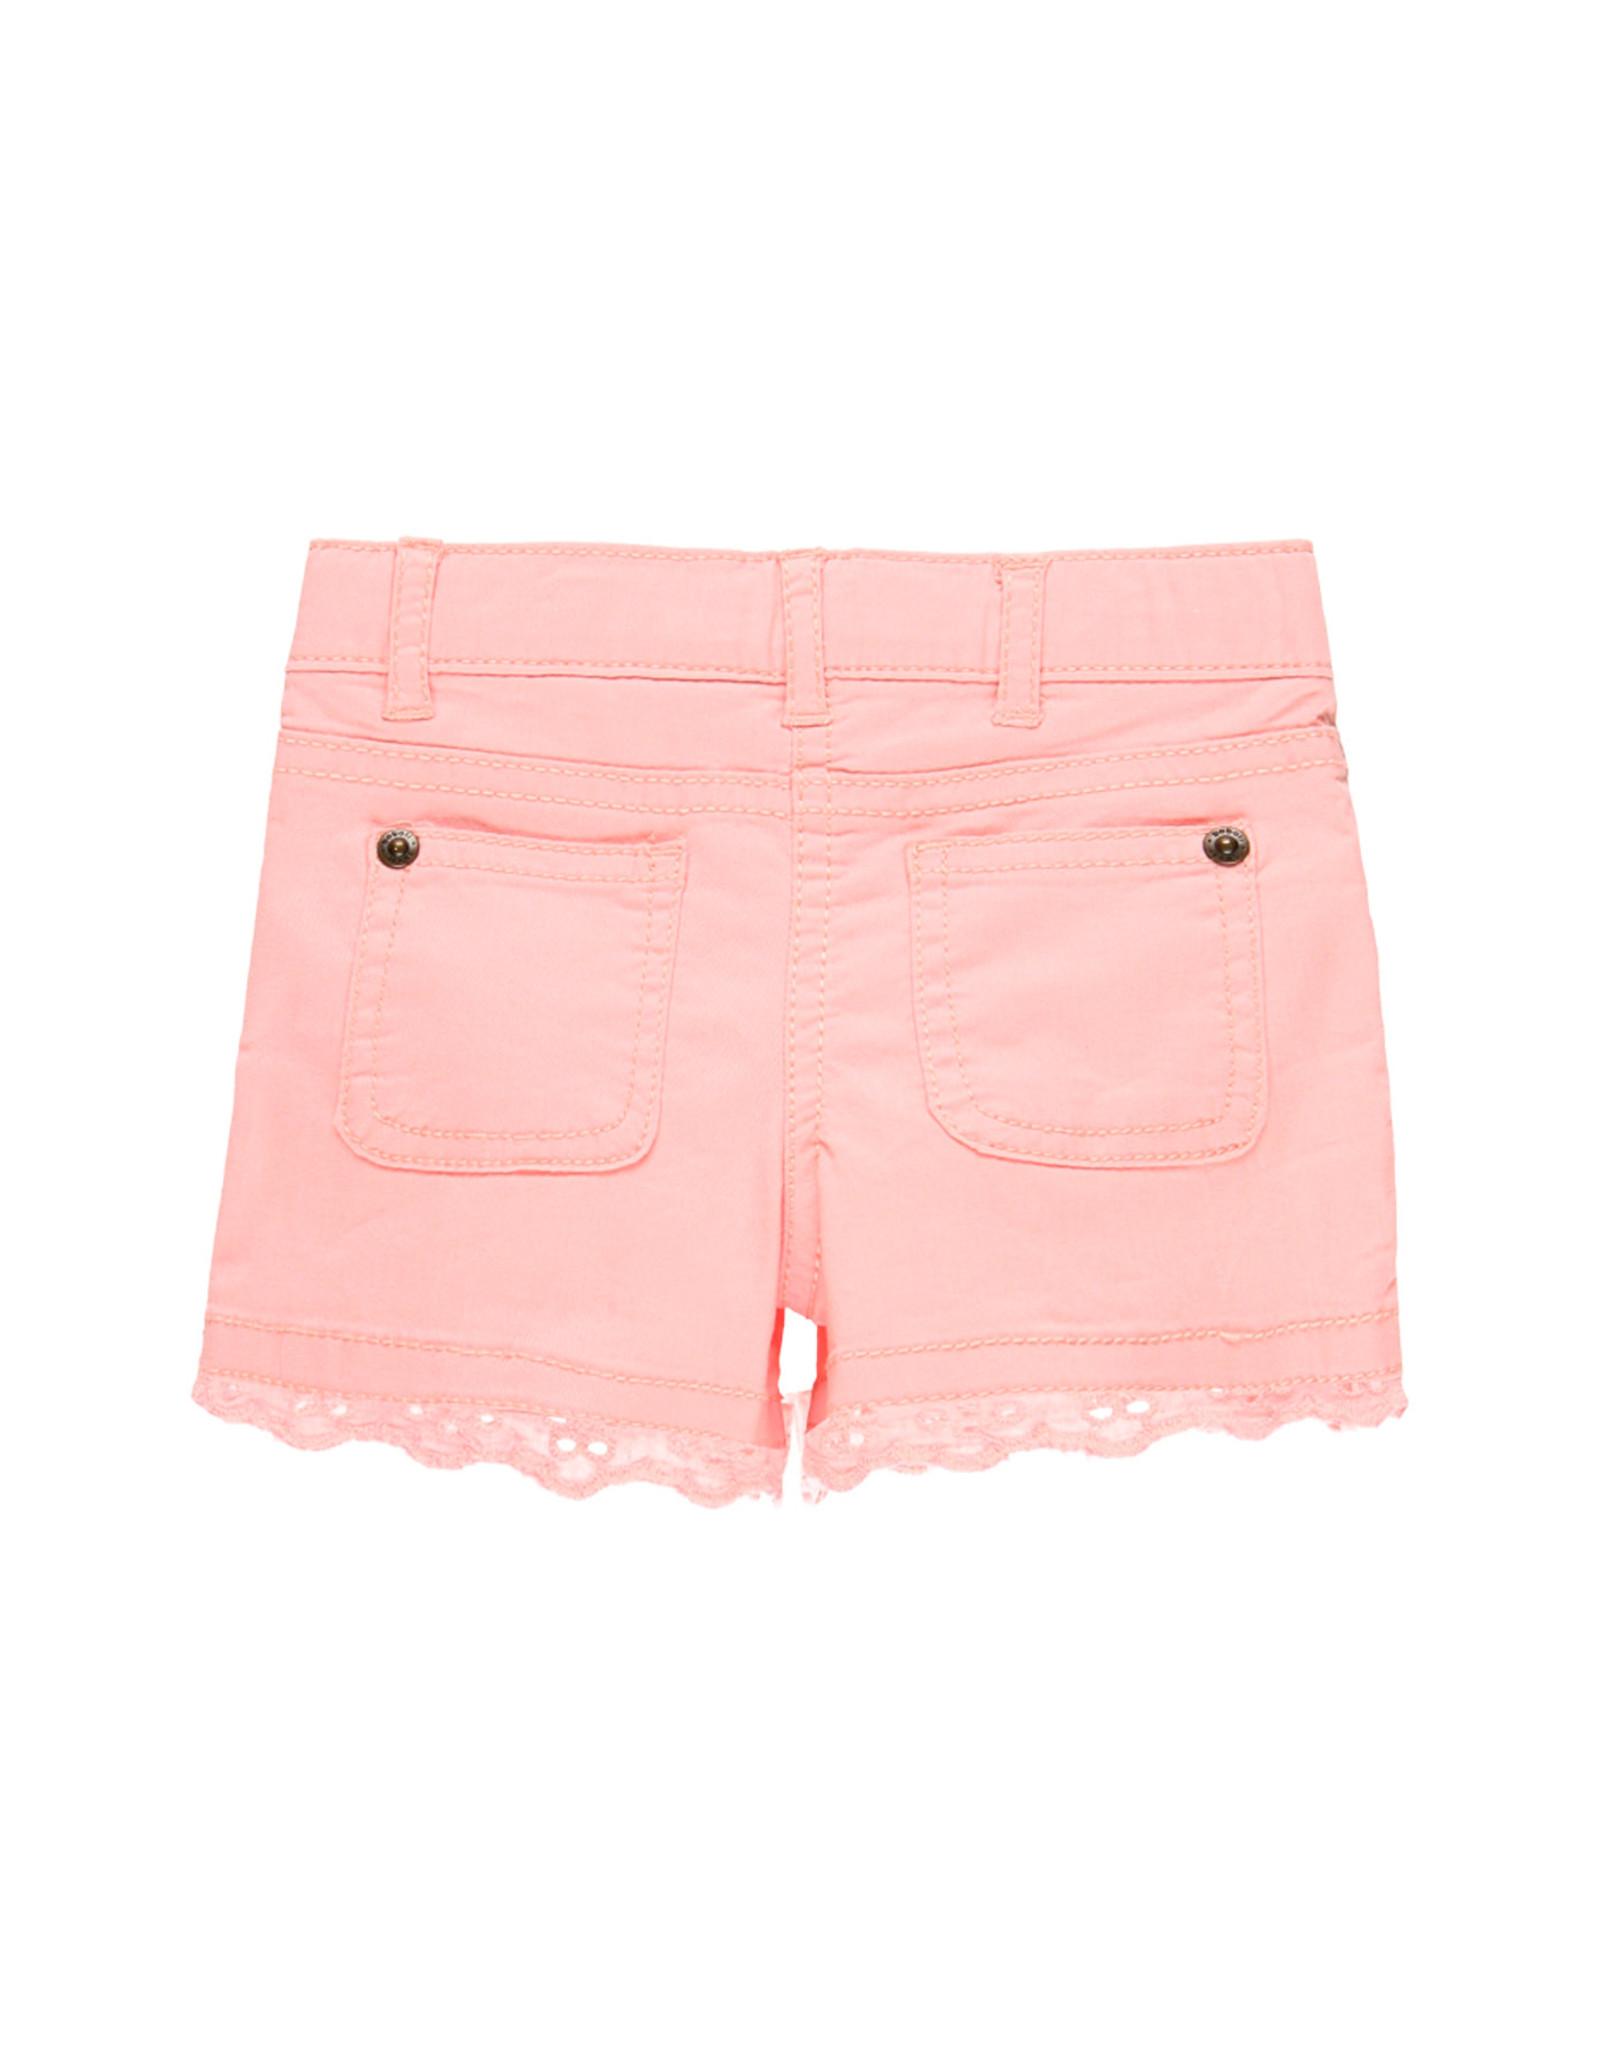 Boboli Stretch Shorts, Pink with Lace Trim